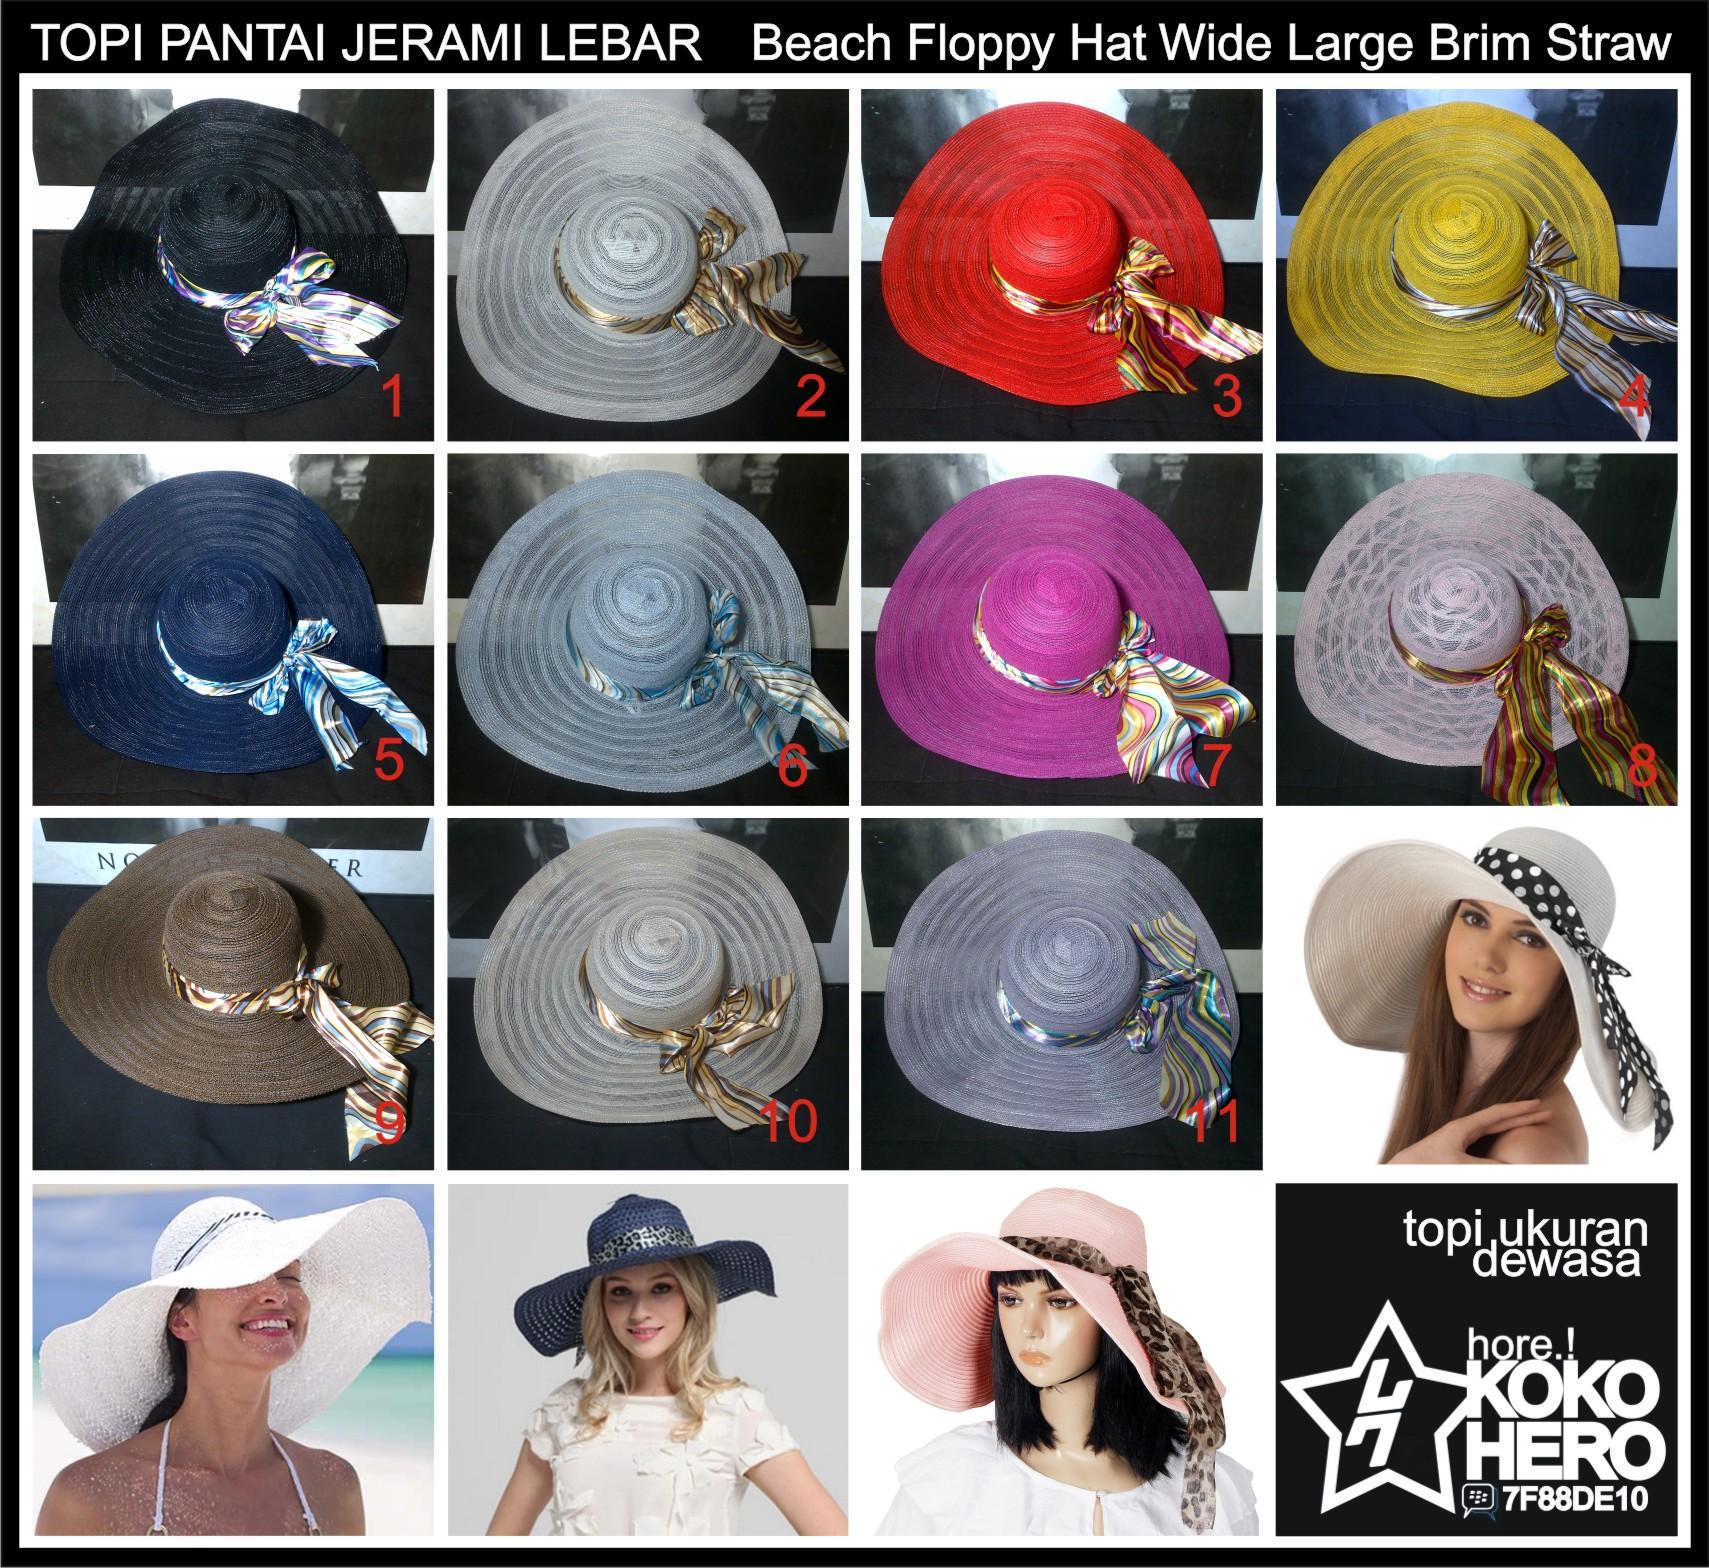 Jual Topi Pantai Pita Jerami Lebar Floppy Straw Hat Ribbon Wide ... ca82fa7612